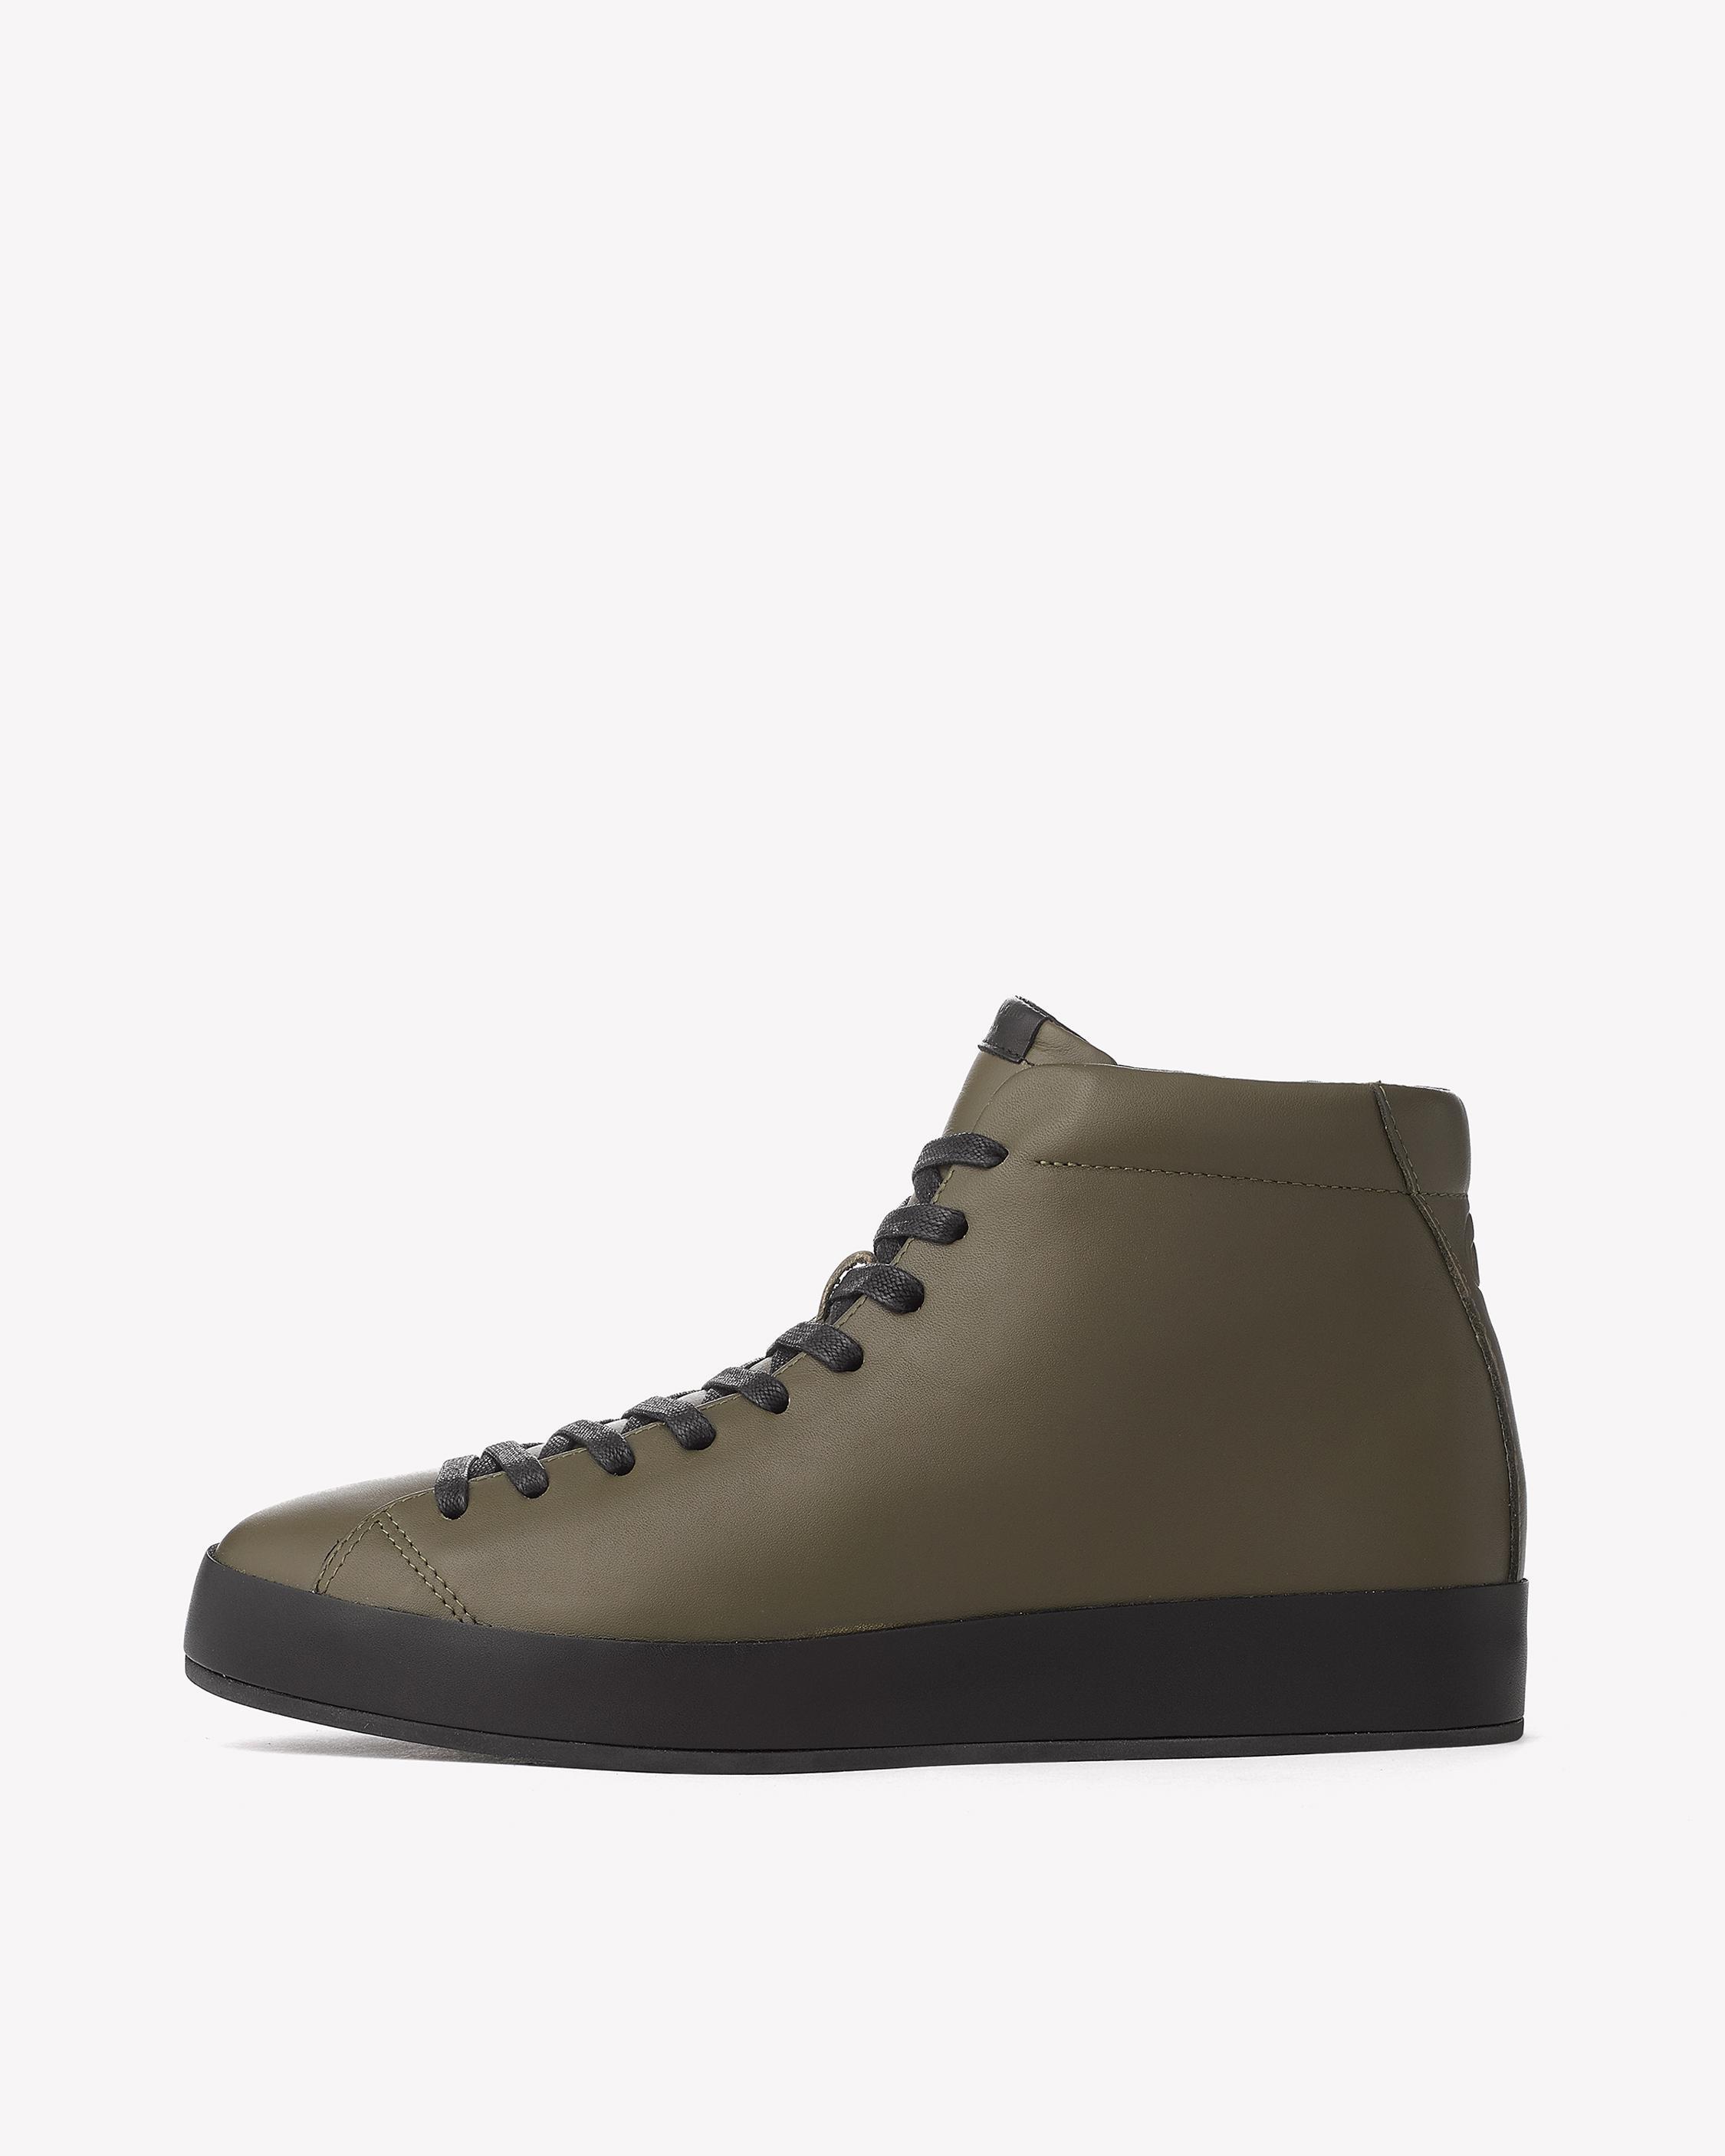 Rag & Bone Green Rb1 Sneakers LiLEPHIF0L